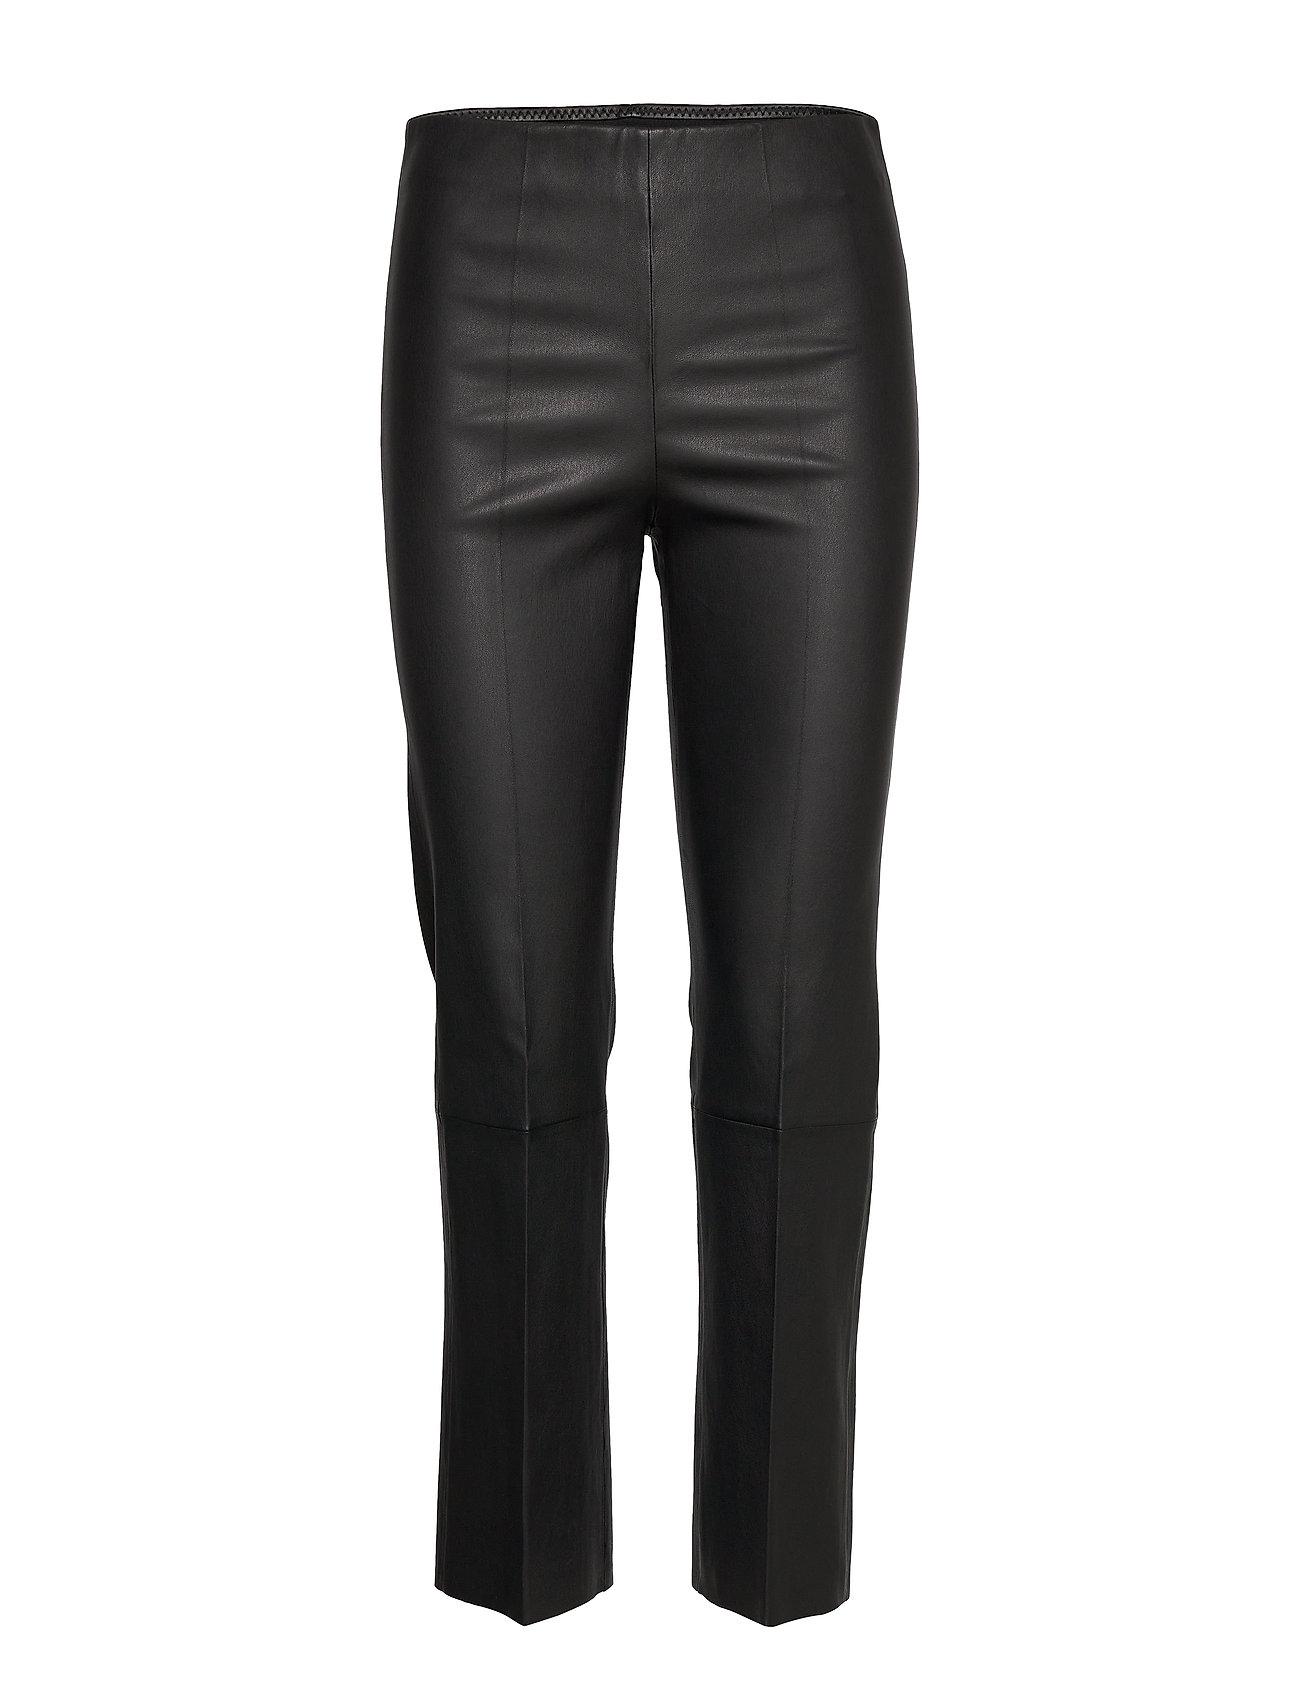 Image of Florentina Leather Leggings/Bukser Sort By Malene Birger (3411923219)